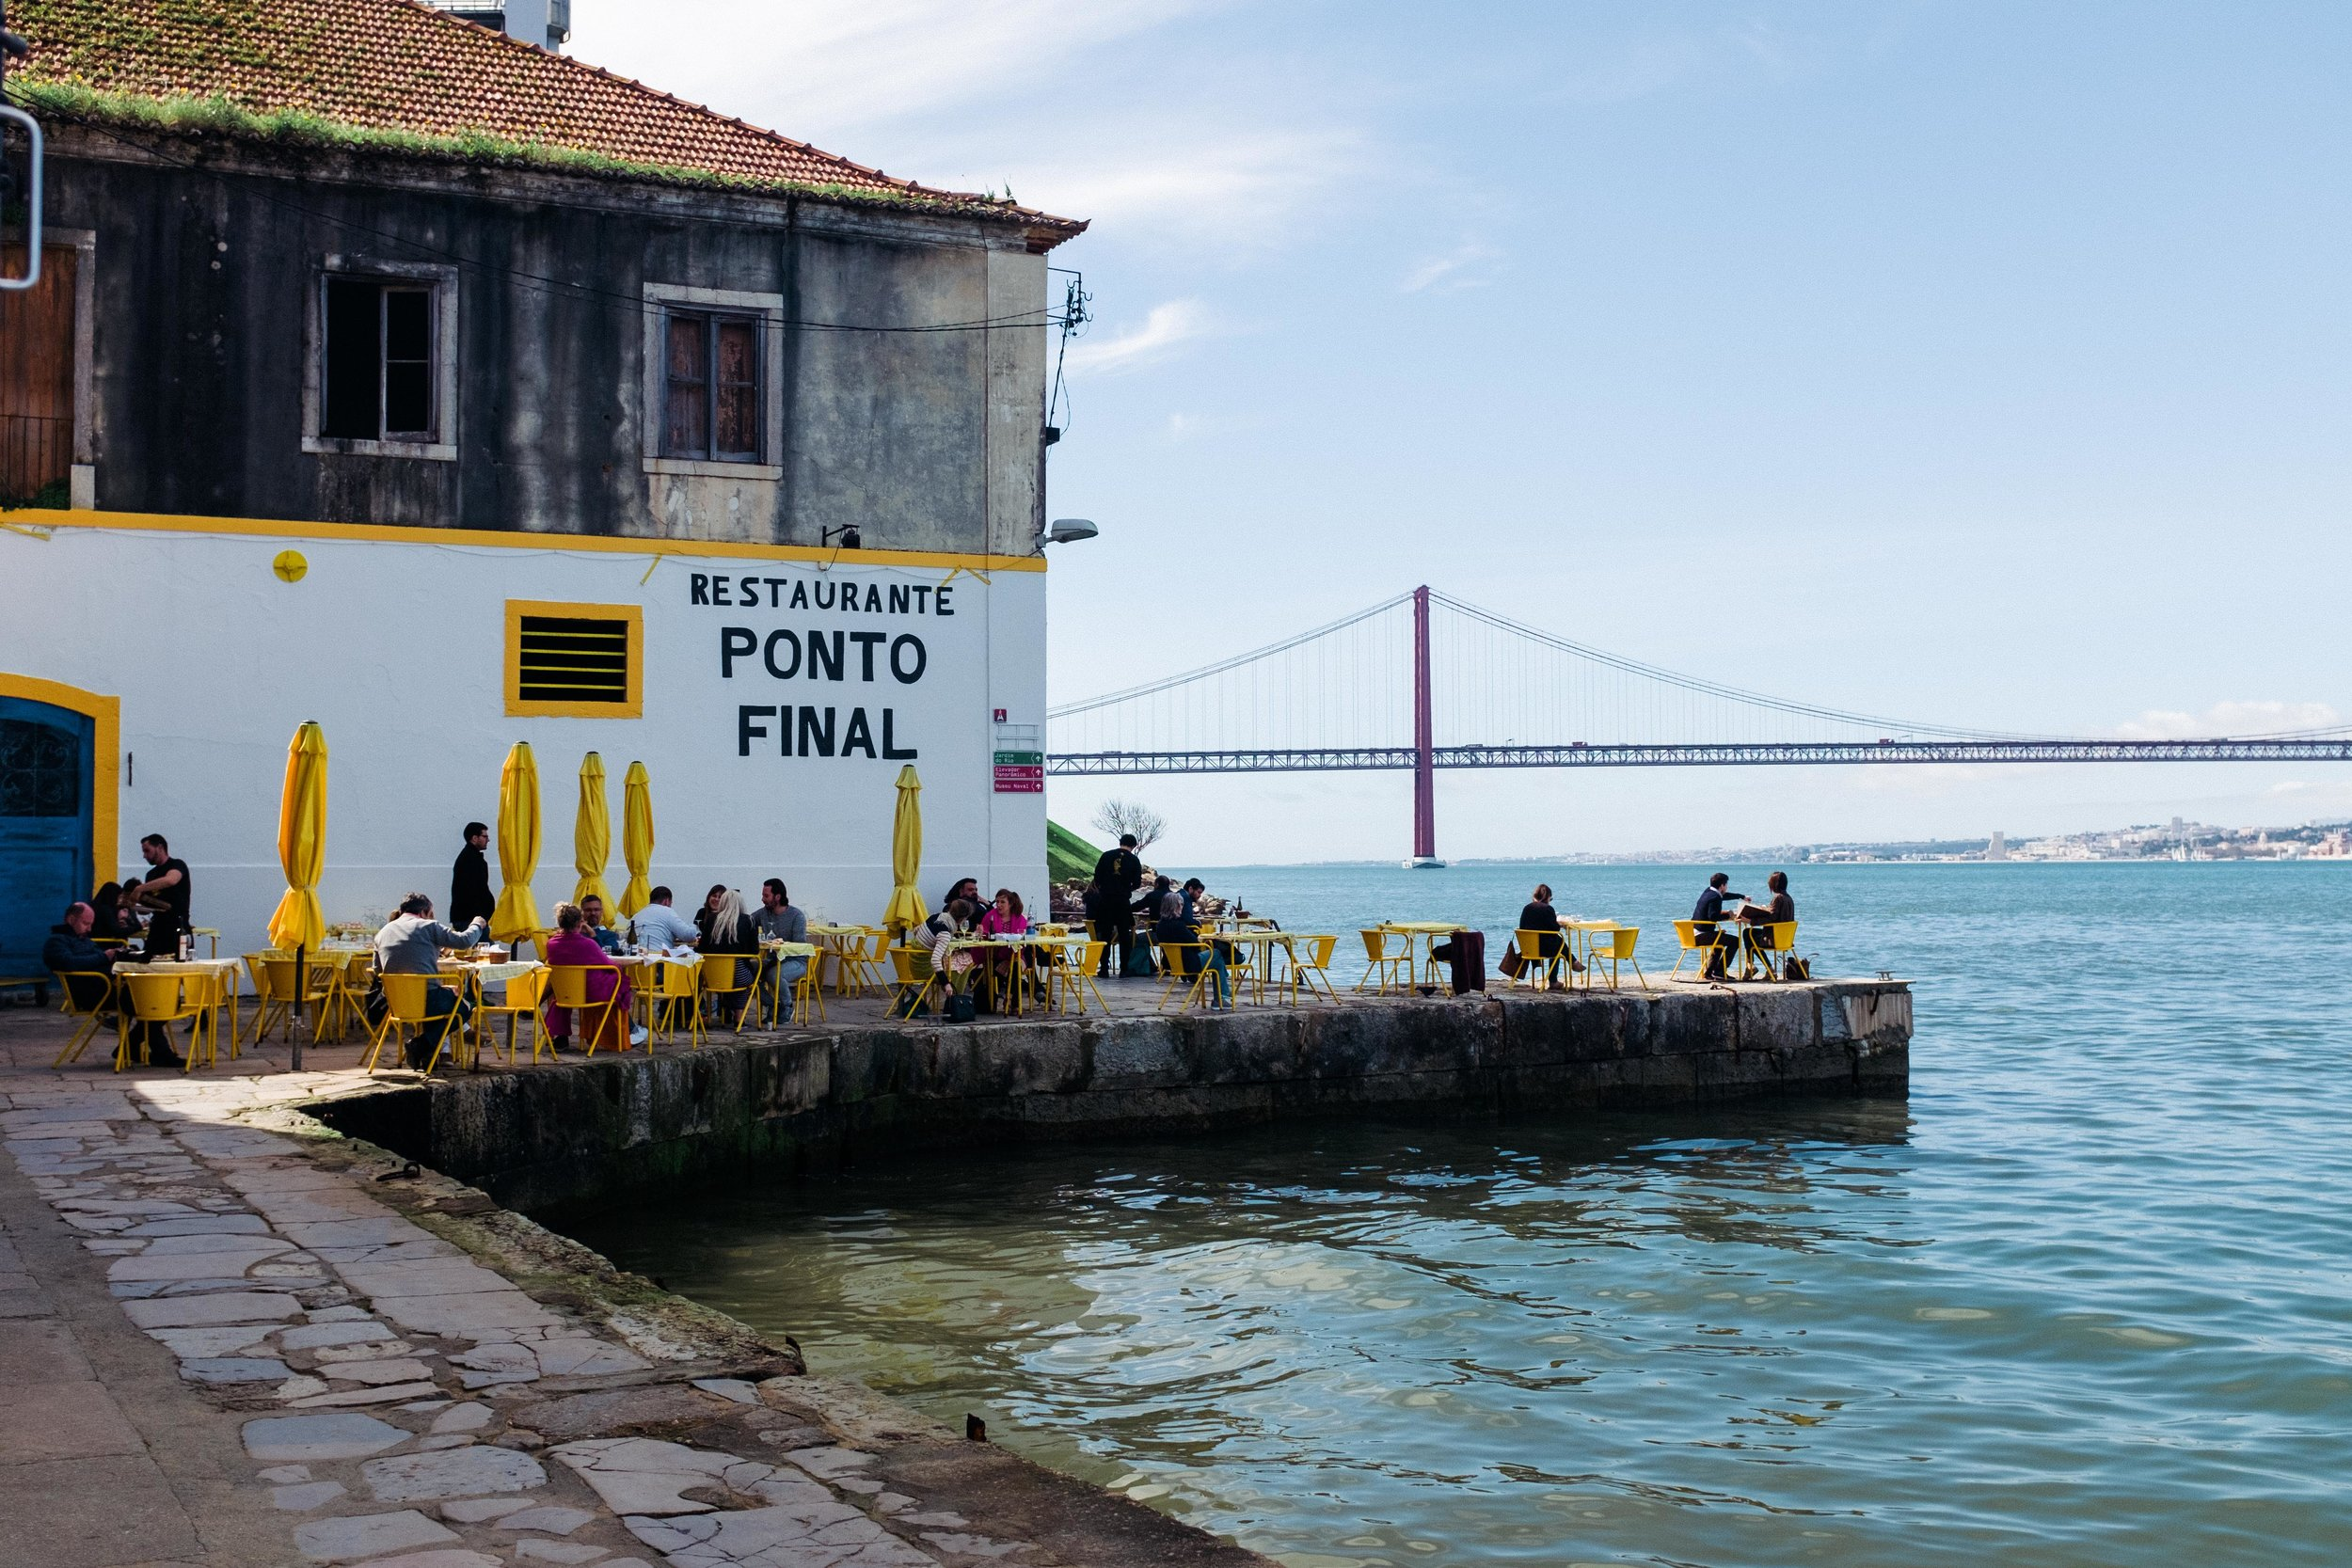 lisbon-portugal-ponto-final-restaurant